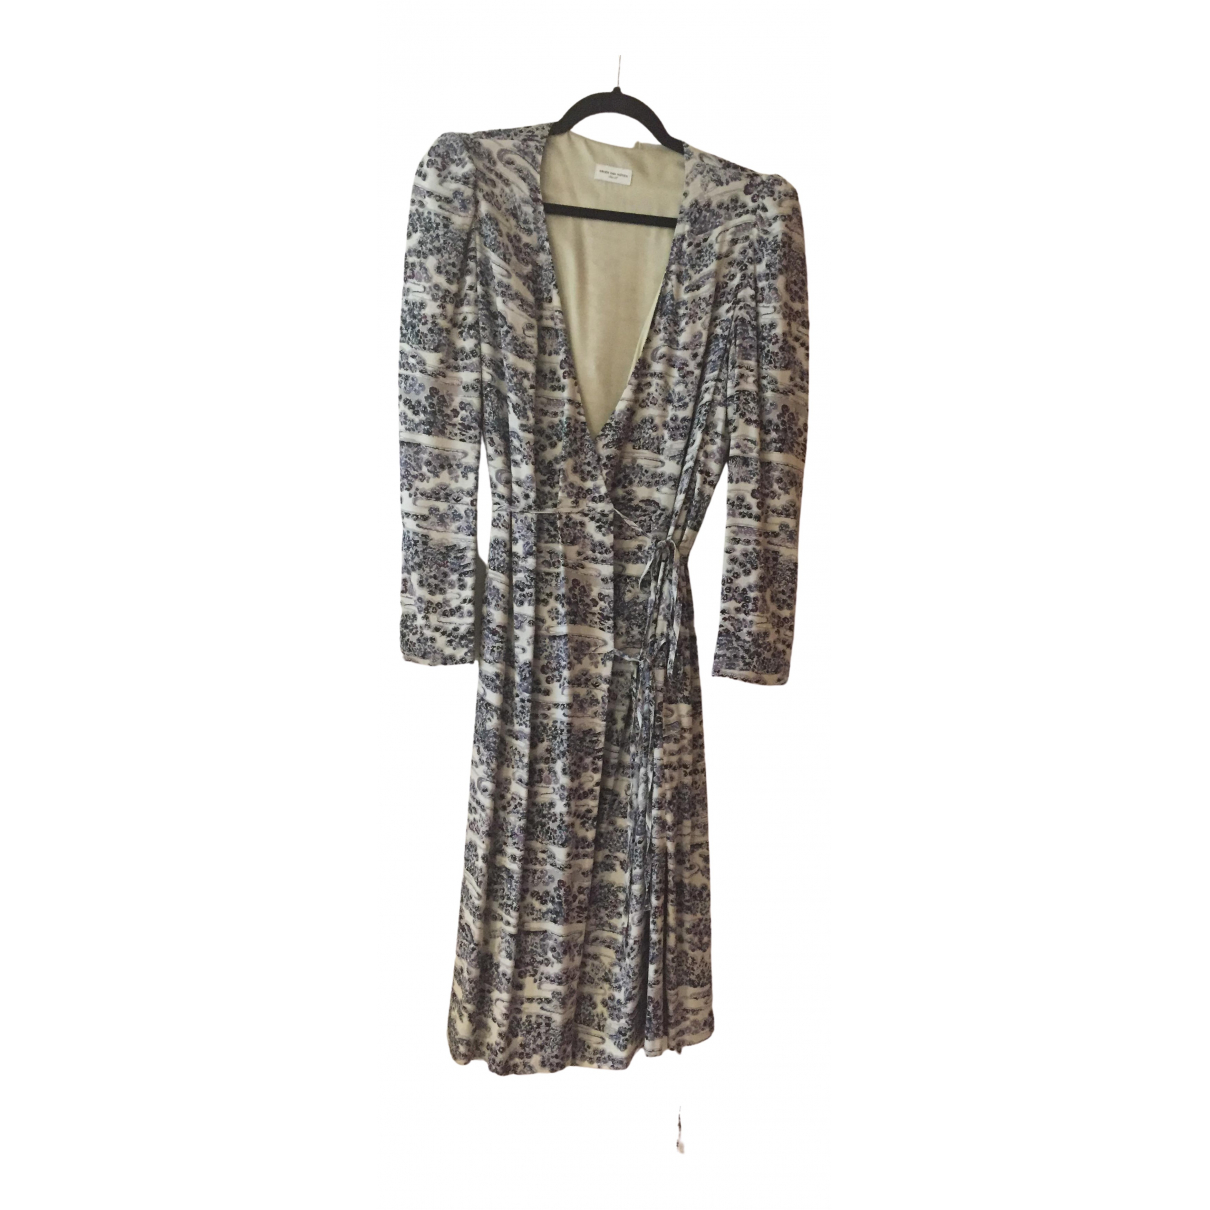 Dries Van Noten \N Multicolour dress for Women 38 FR